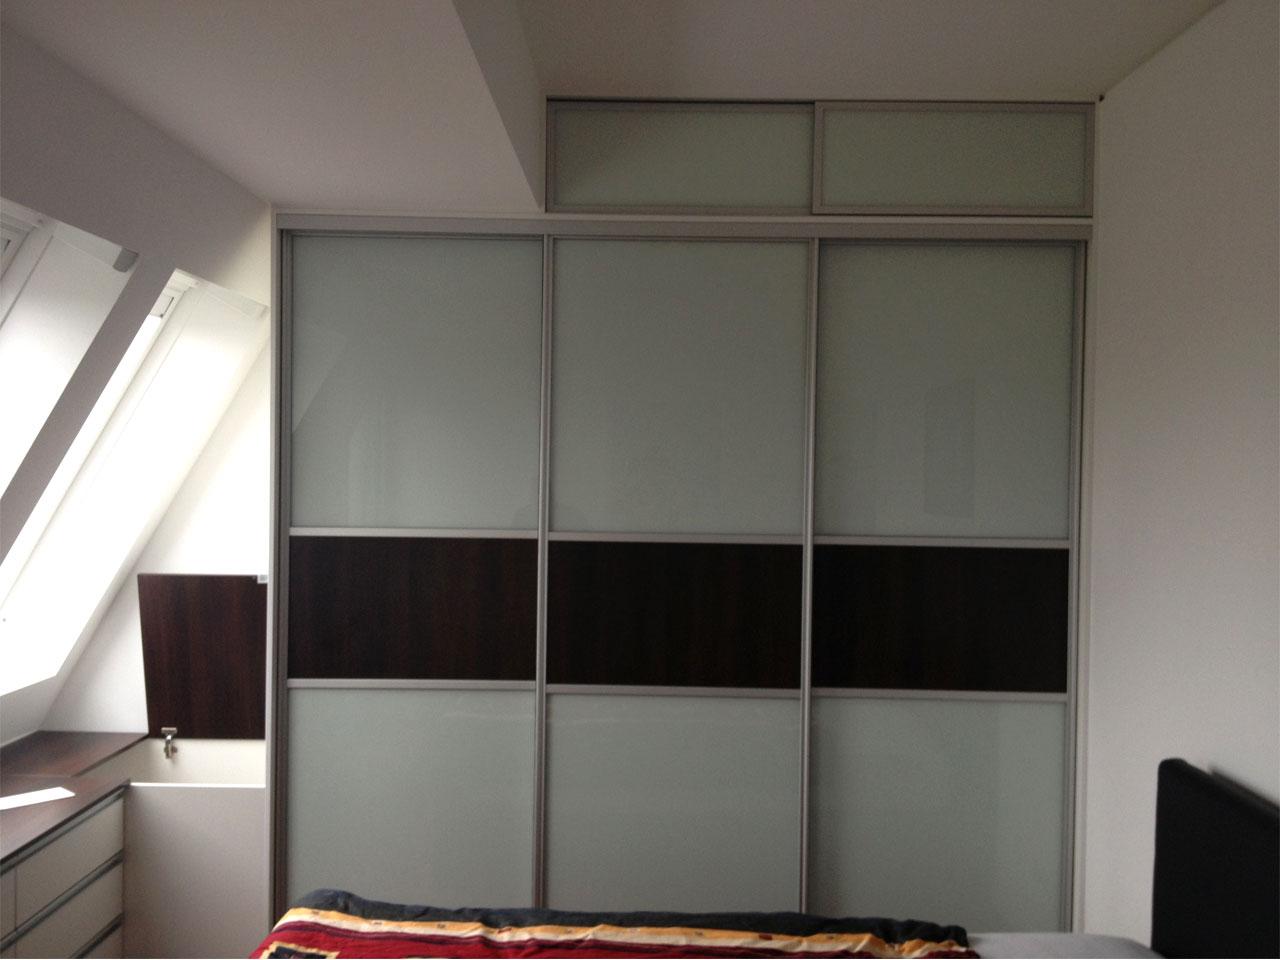 Schlafzimmerschrank mit Kommode im Dachgeschoss  STAURAUMFABRIK